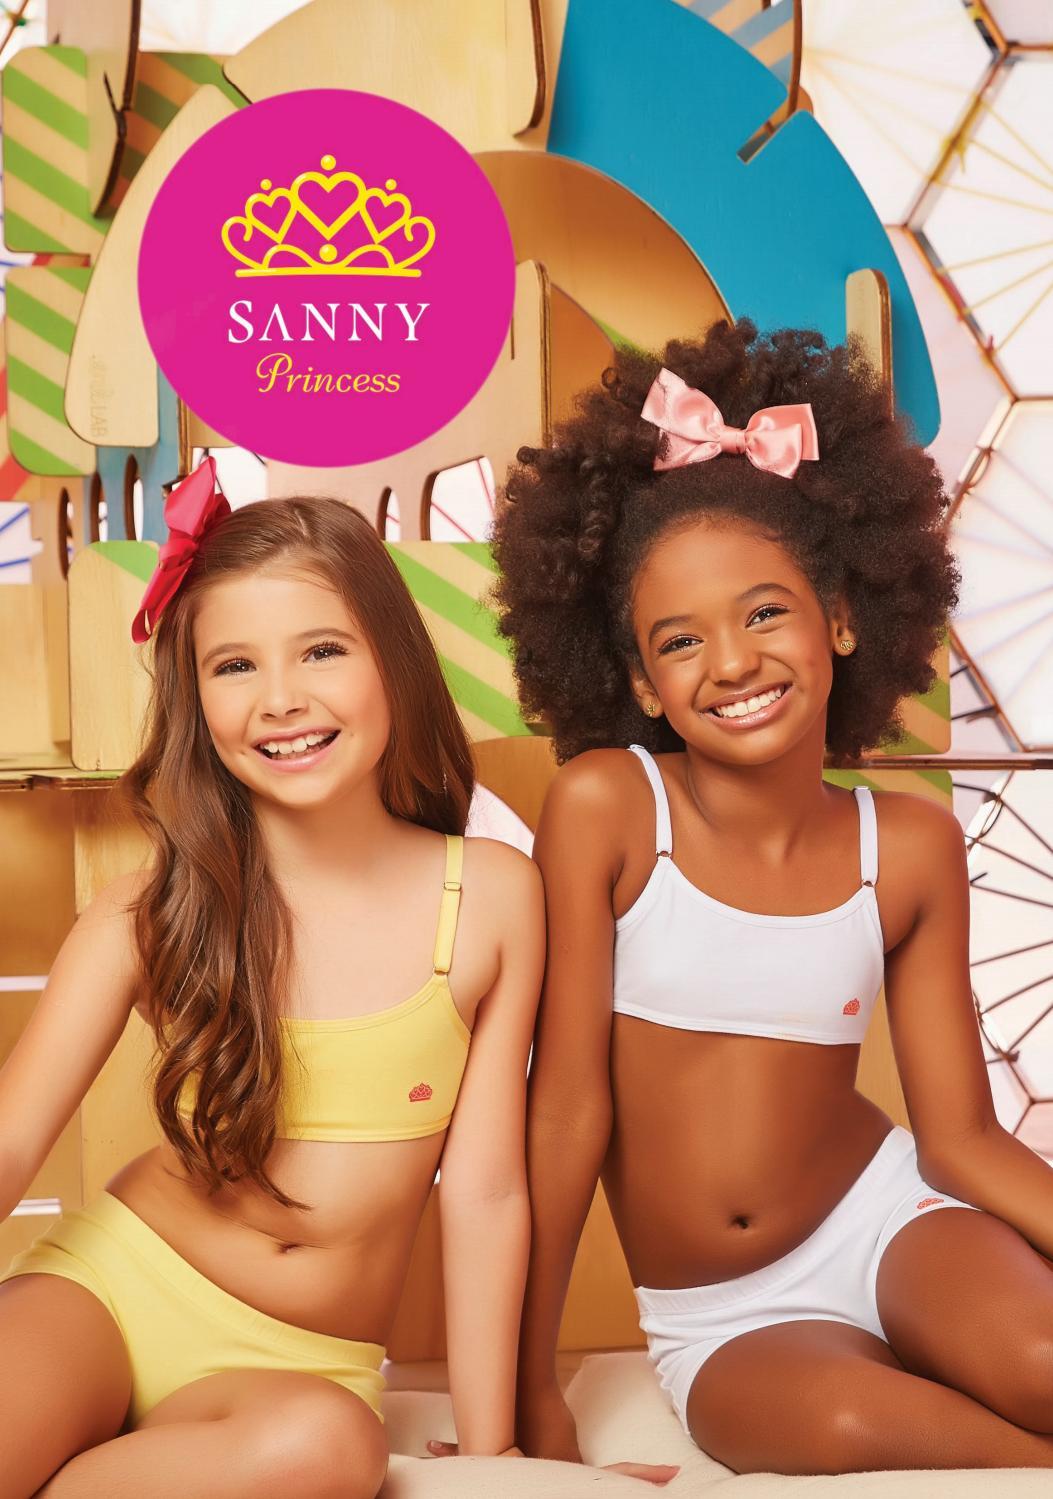 Sanny Princess - Coleção Vem brincar! by Sanny Lingerie - issuu b051d714add